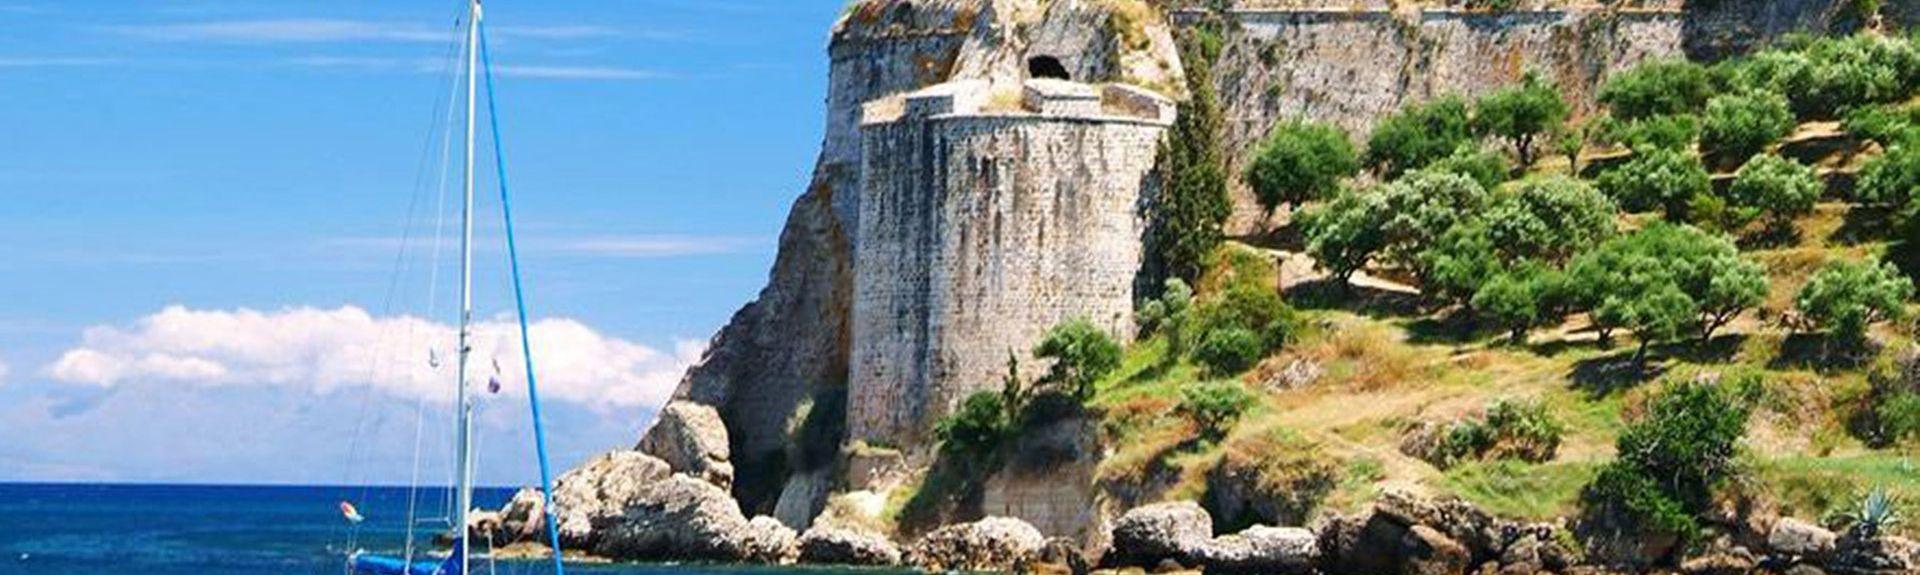 Aristomenis, Messini, Peloponnese, Greece